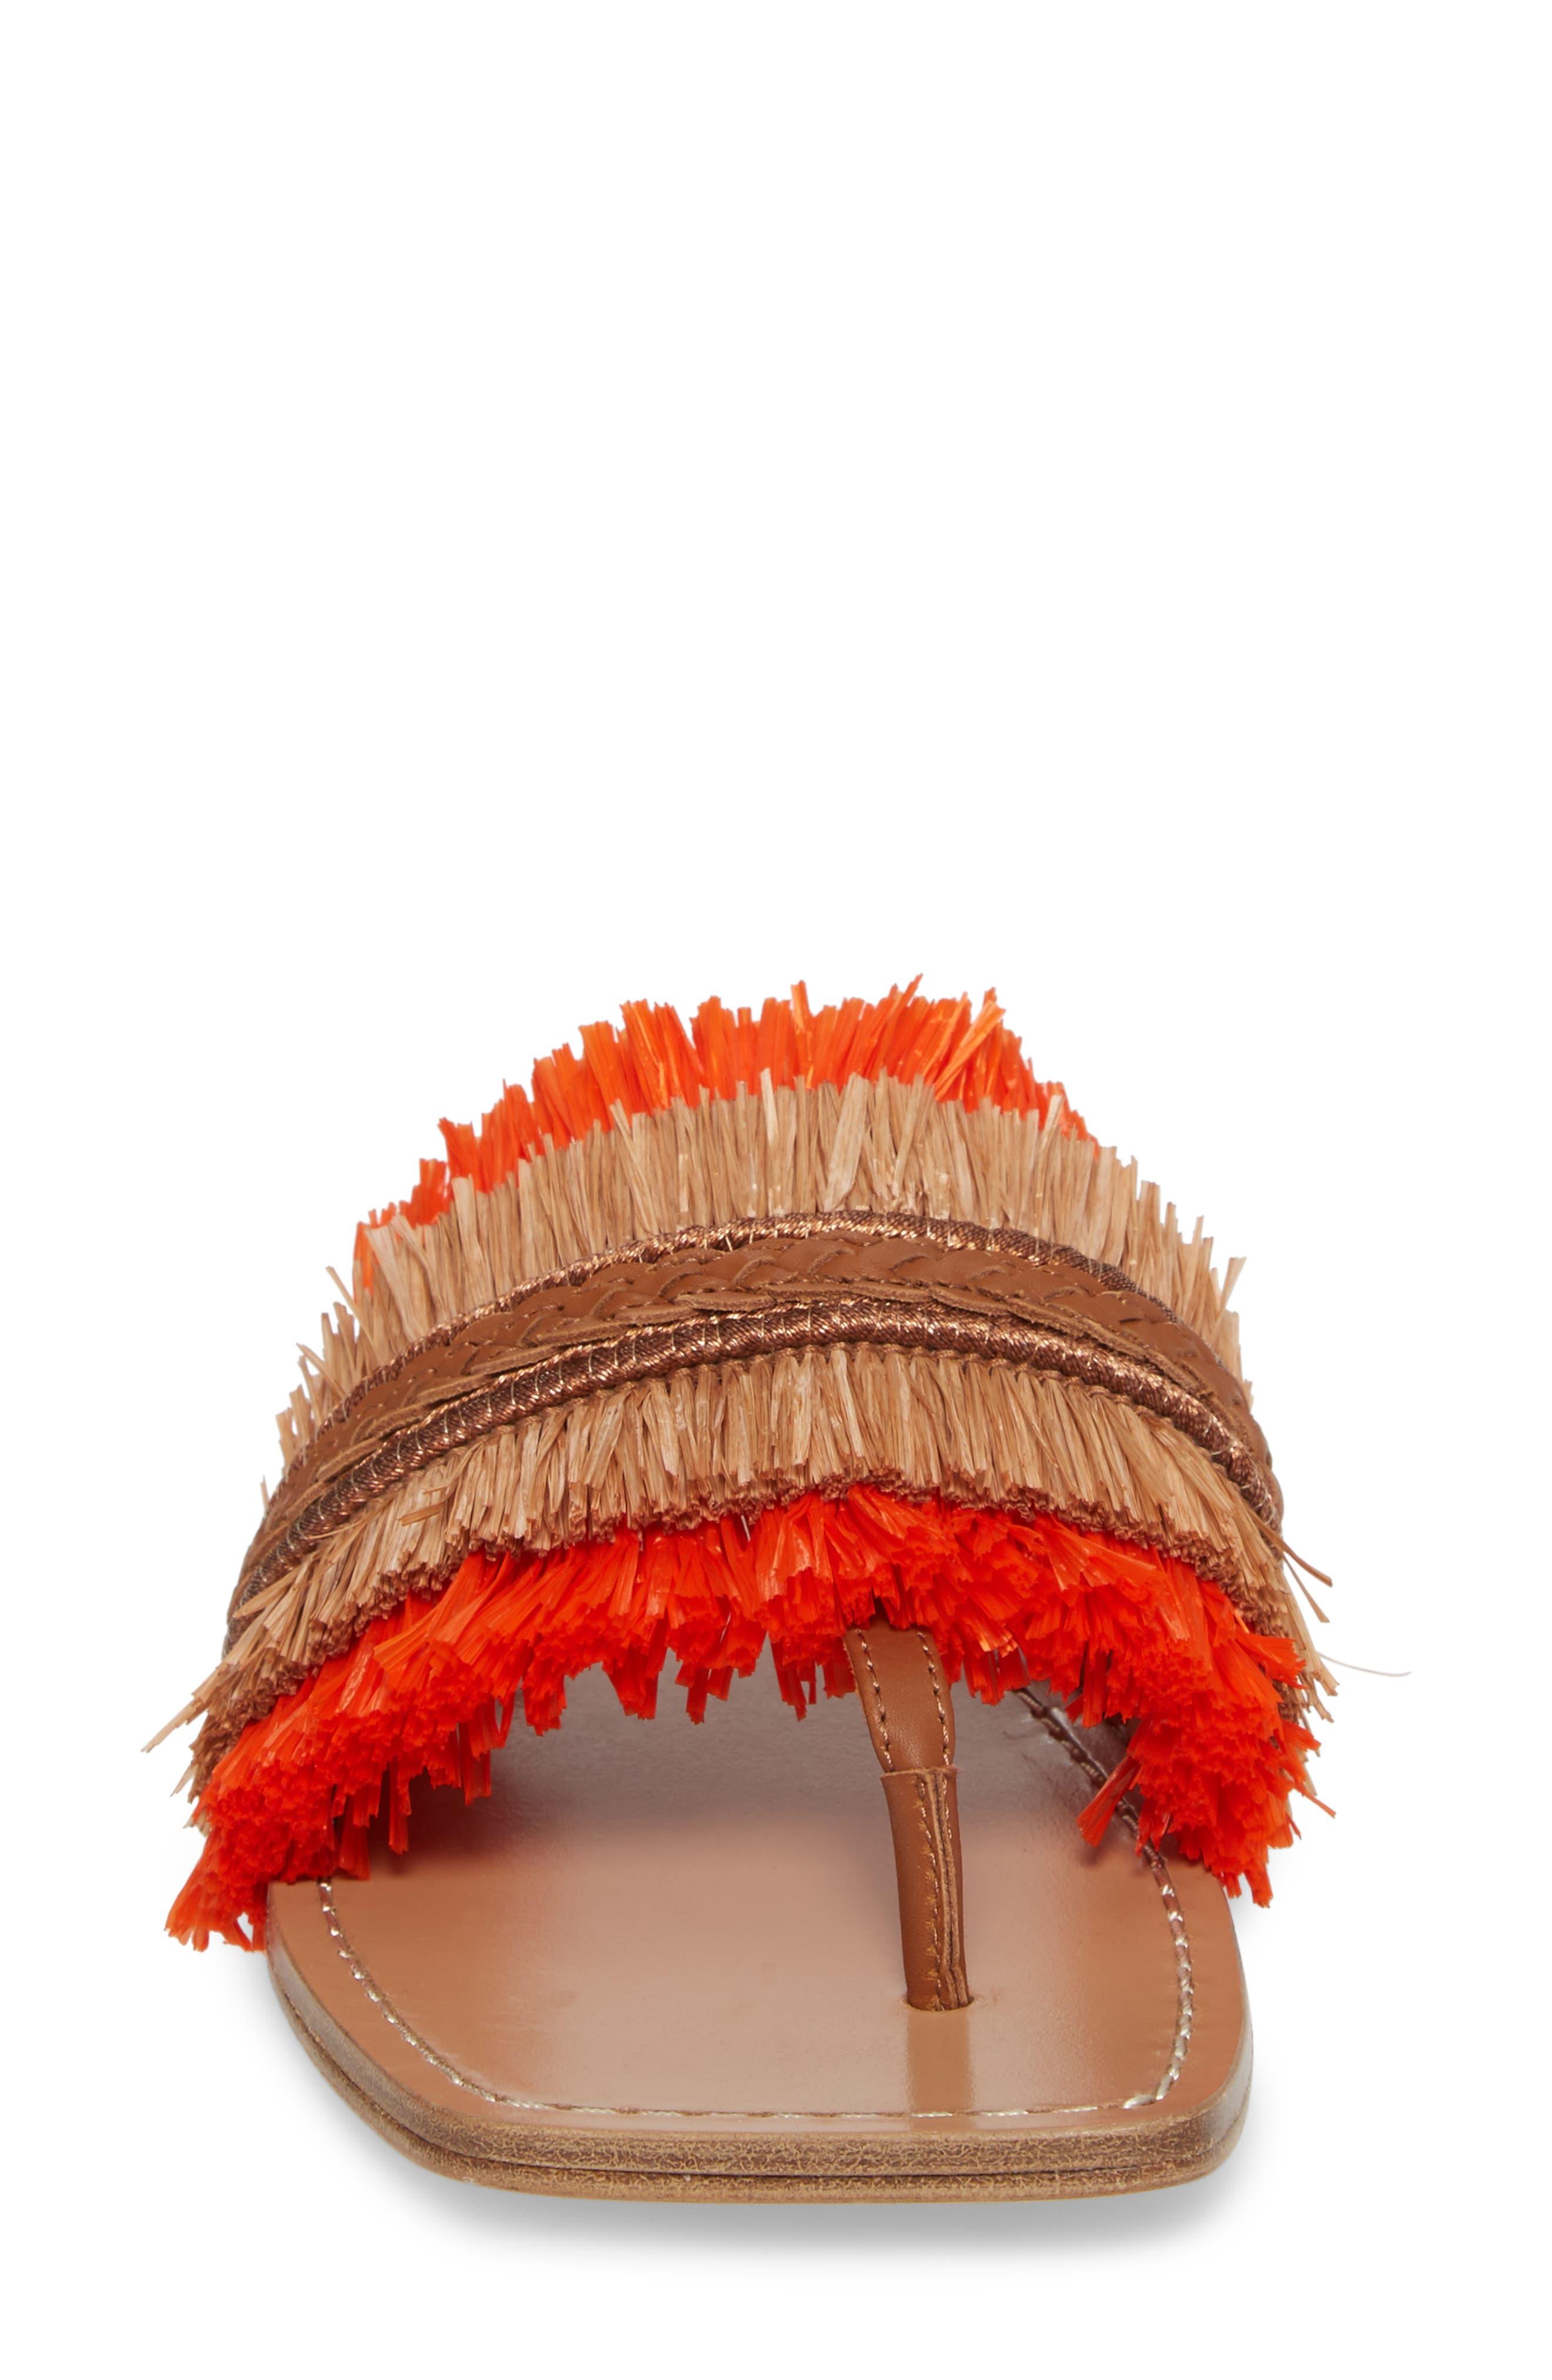 Woven Sandal,                             Alternate thumbnail 4, color,                             Tan/ Orange